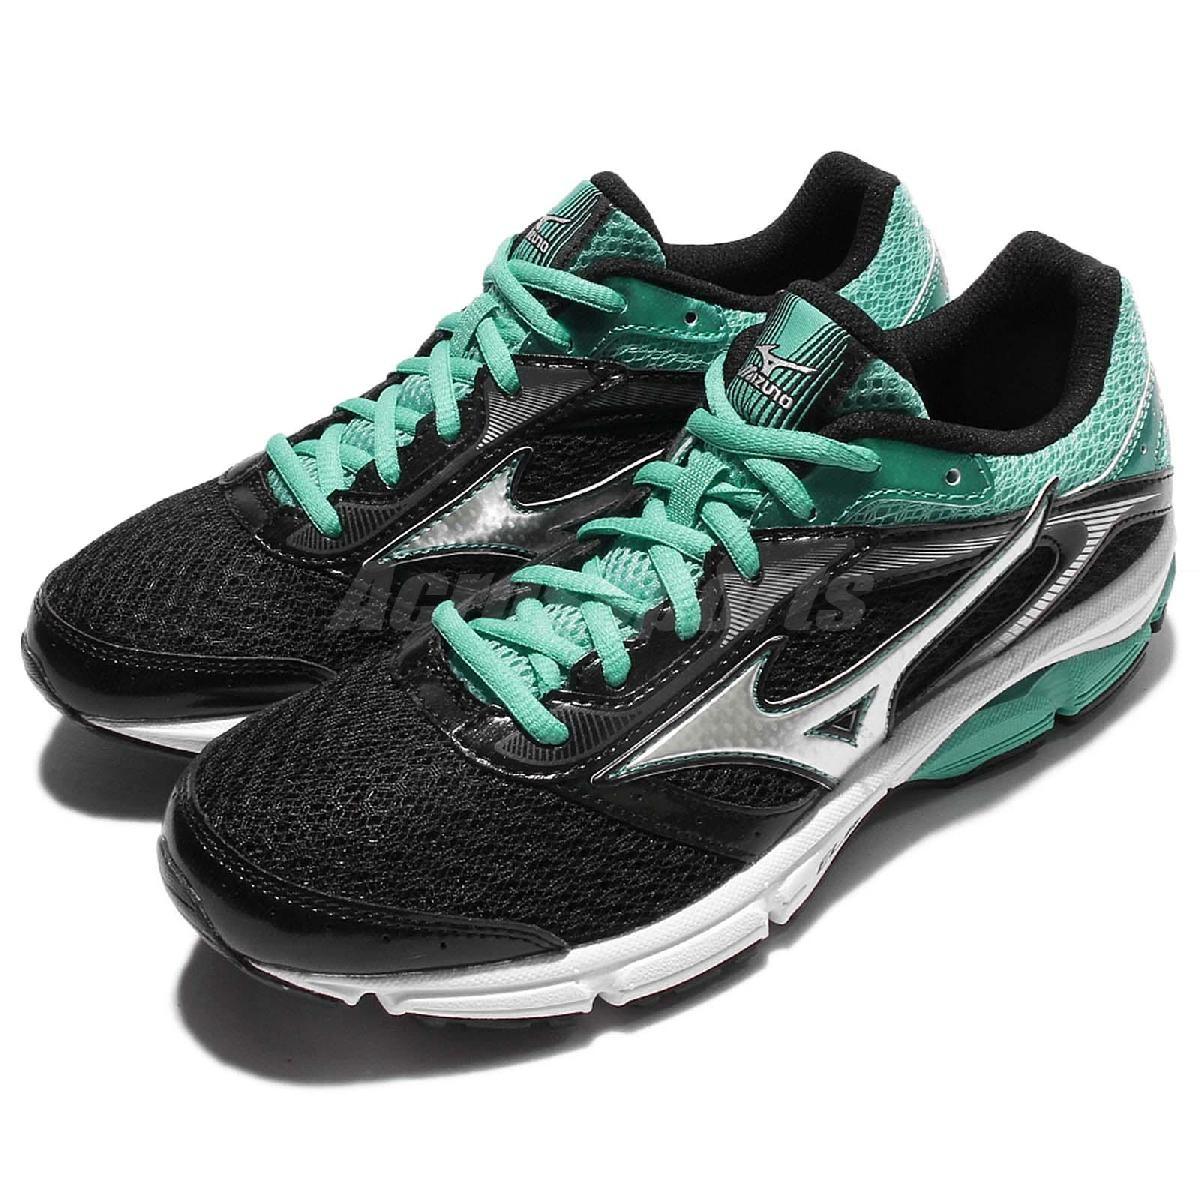 Mizuno 慢跑鞋 Wave Impetus 4 黑 綠 銀 入門款 女鞋 運動鞋【PUMP306】 J1GD161305